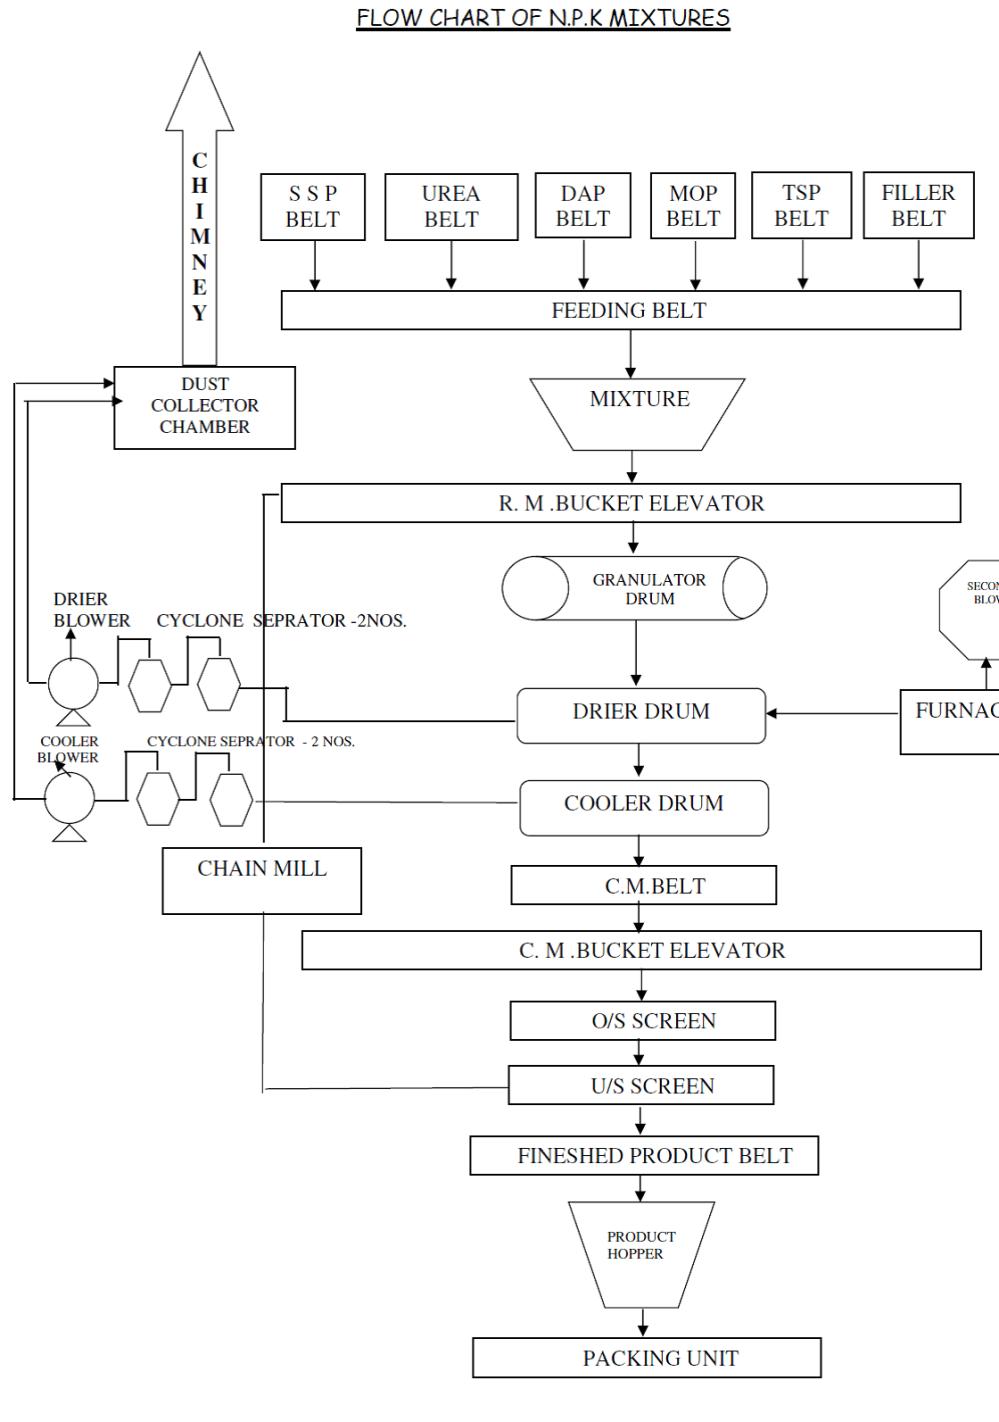 medium resolution of npk fertilizer production processes